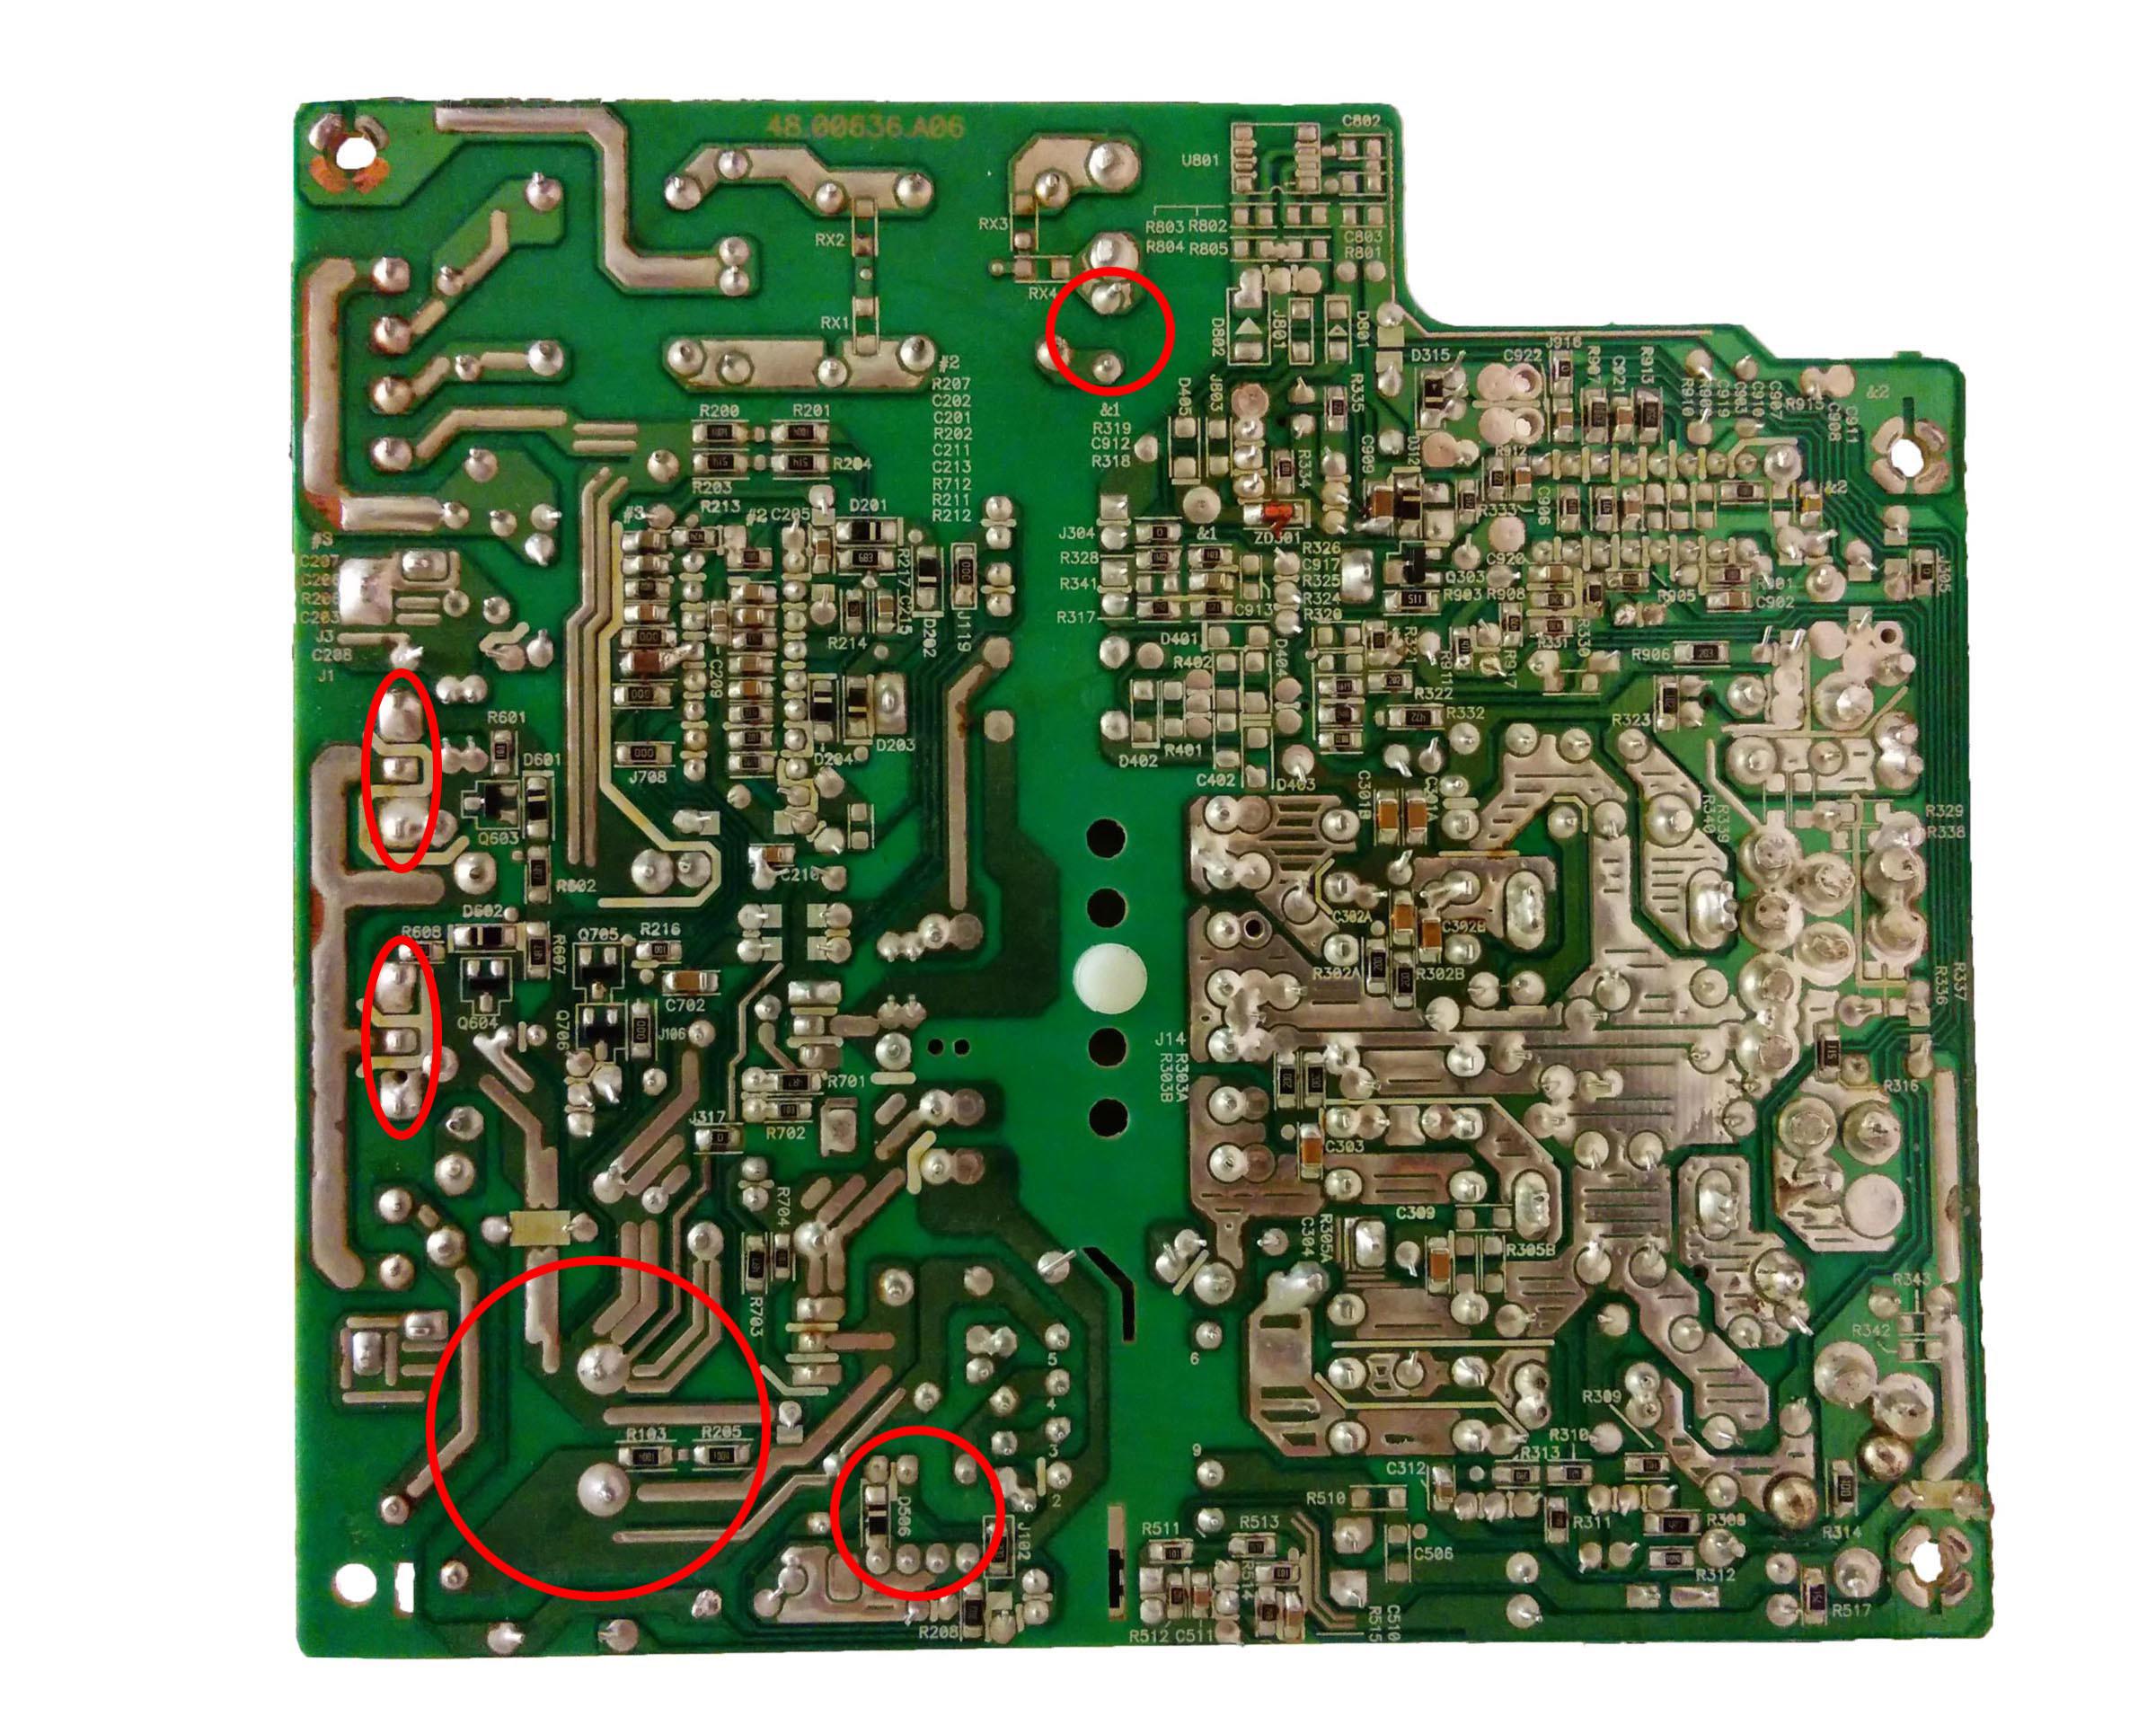 OCZ ModXStream Pro 600W PSU Repair